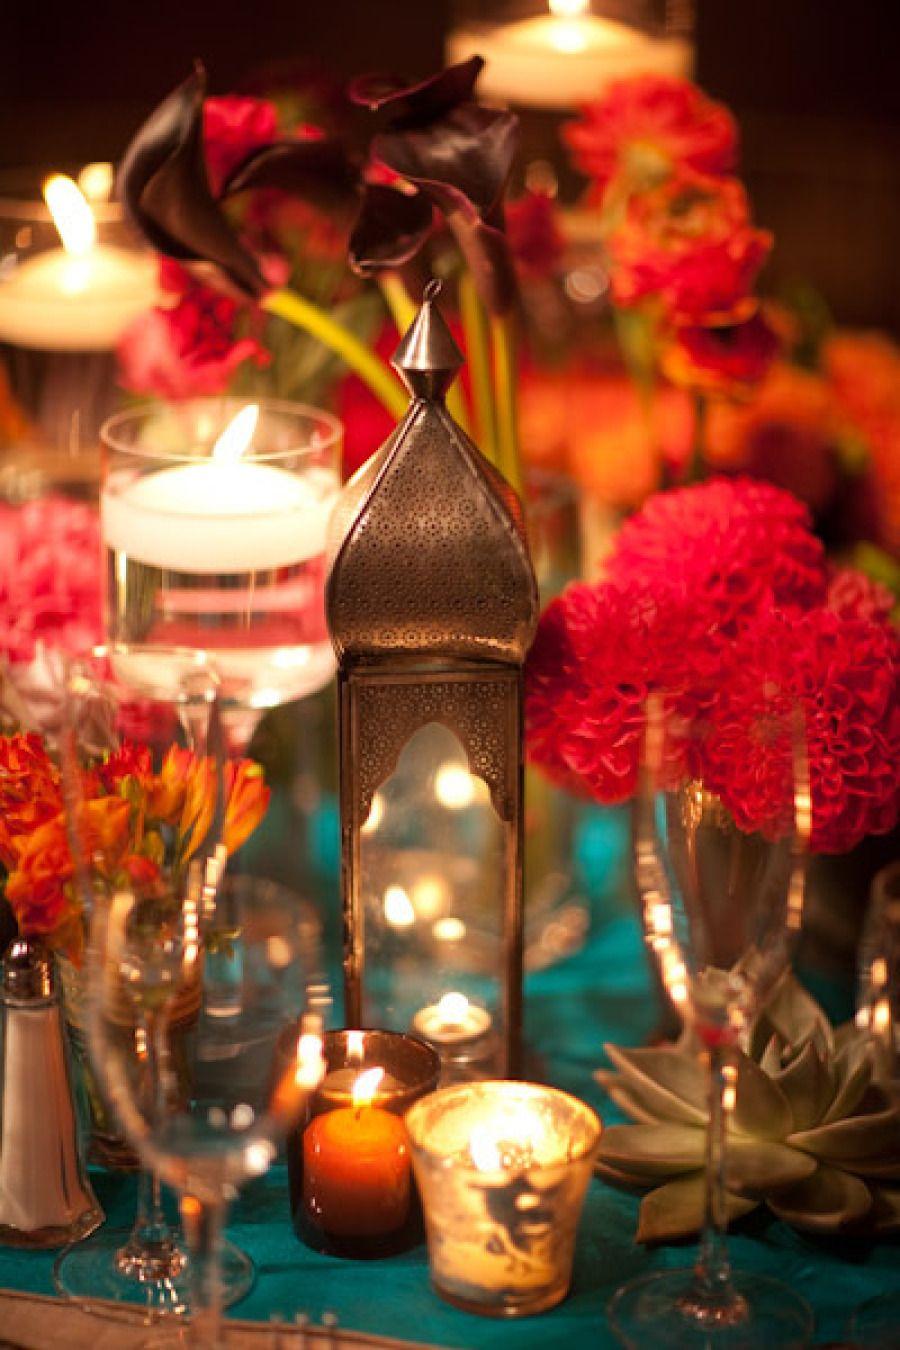 Tarrytown estate wedding from shira weinberger chandelier events event planning chandelier events httpstylemepretty aloadofball Choice Image